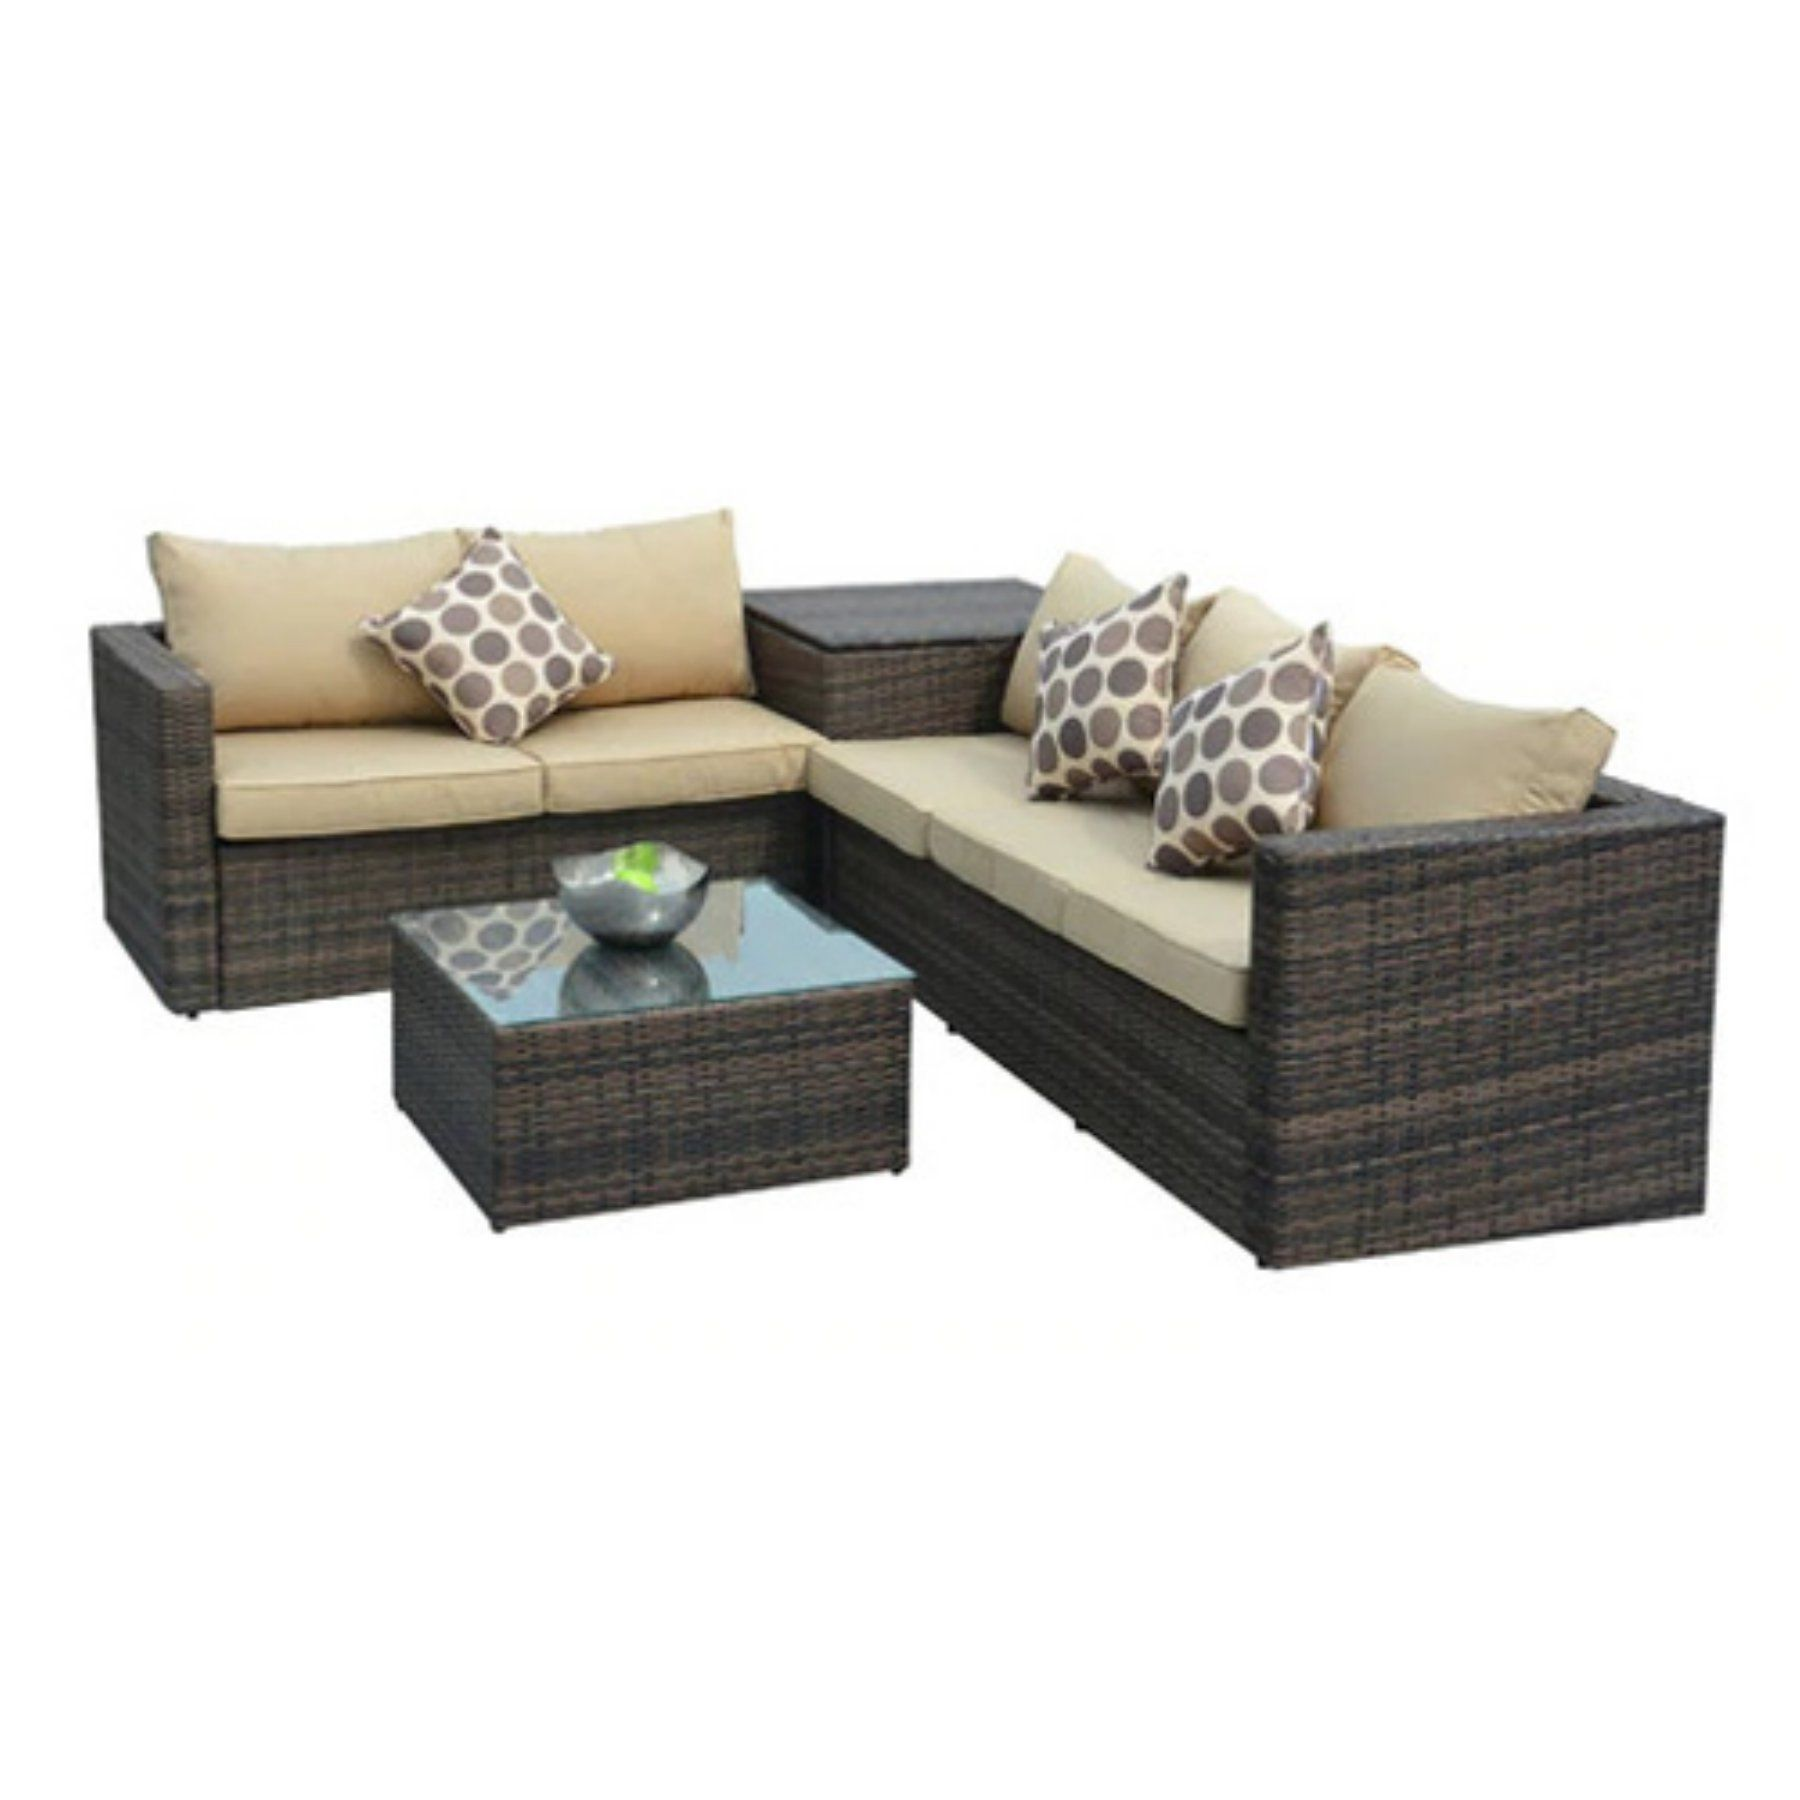 Outdoor direct wicker jasmine brown 4 piece wicker patio furniture conversation set